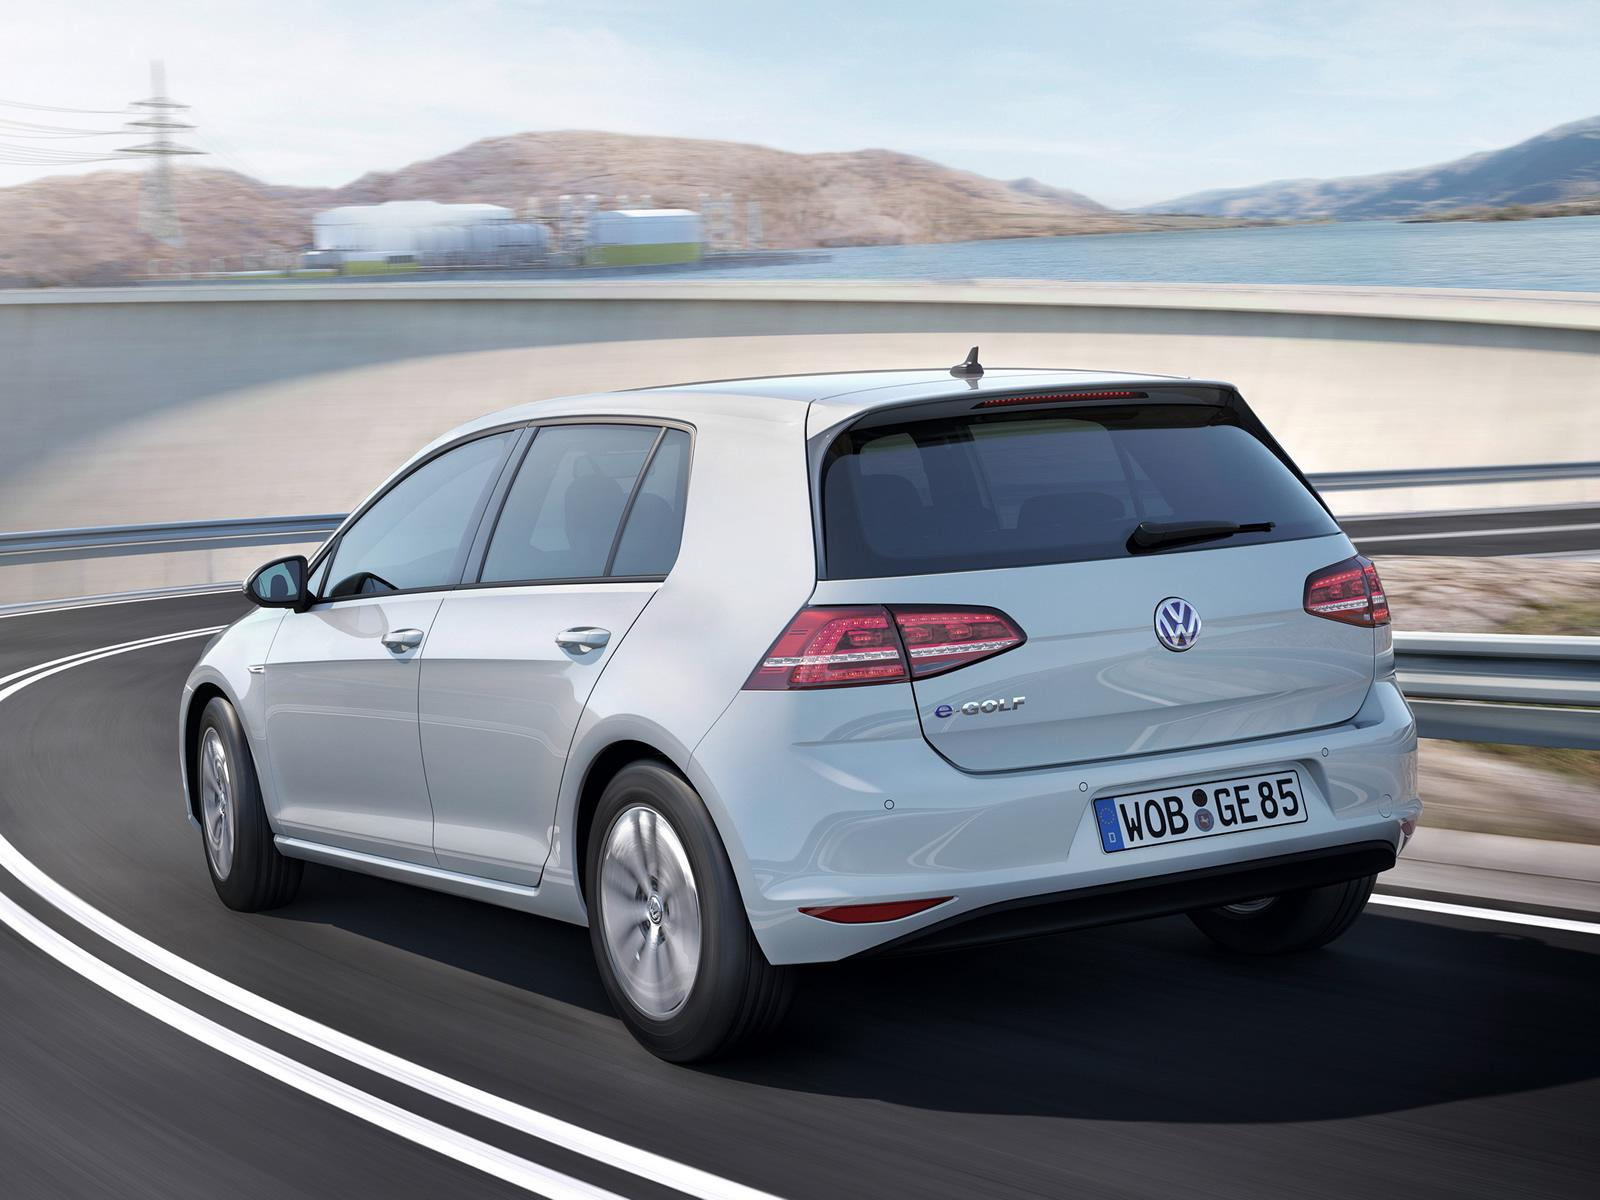 VW eGolf Heckansicht